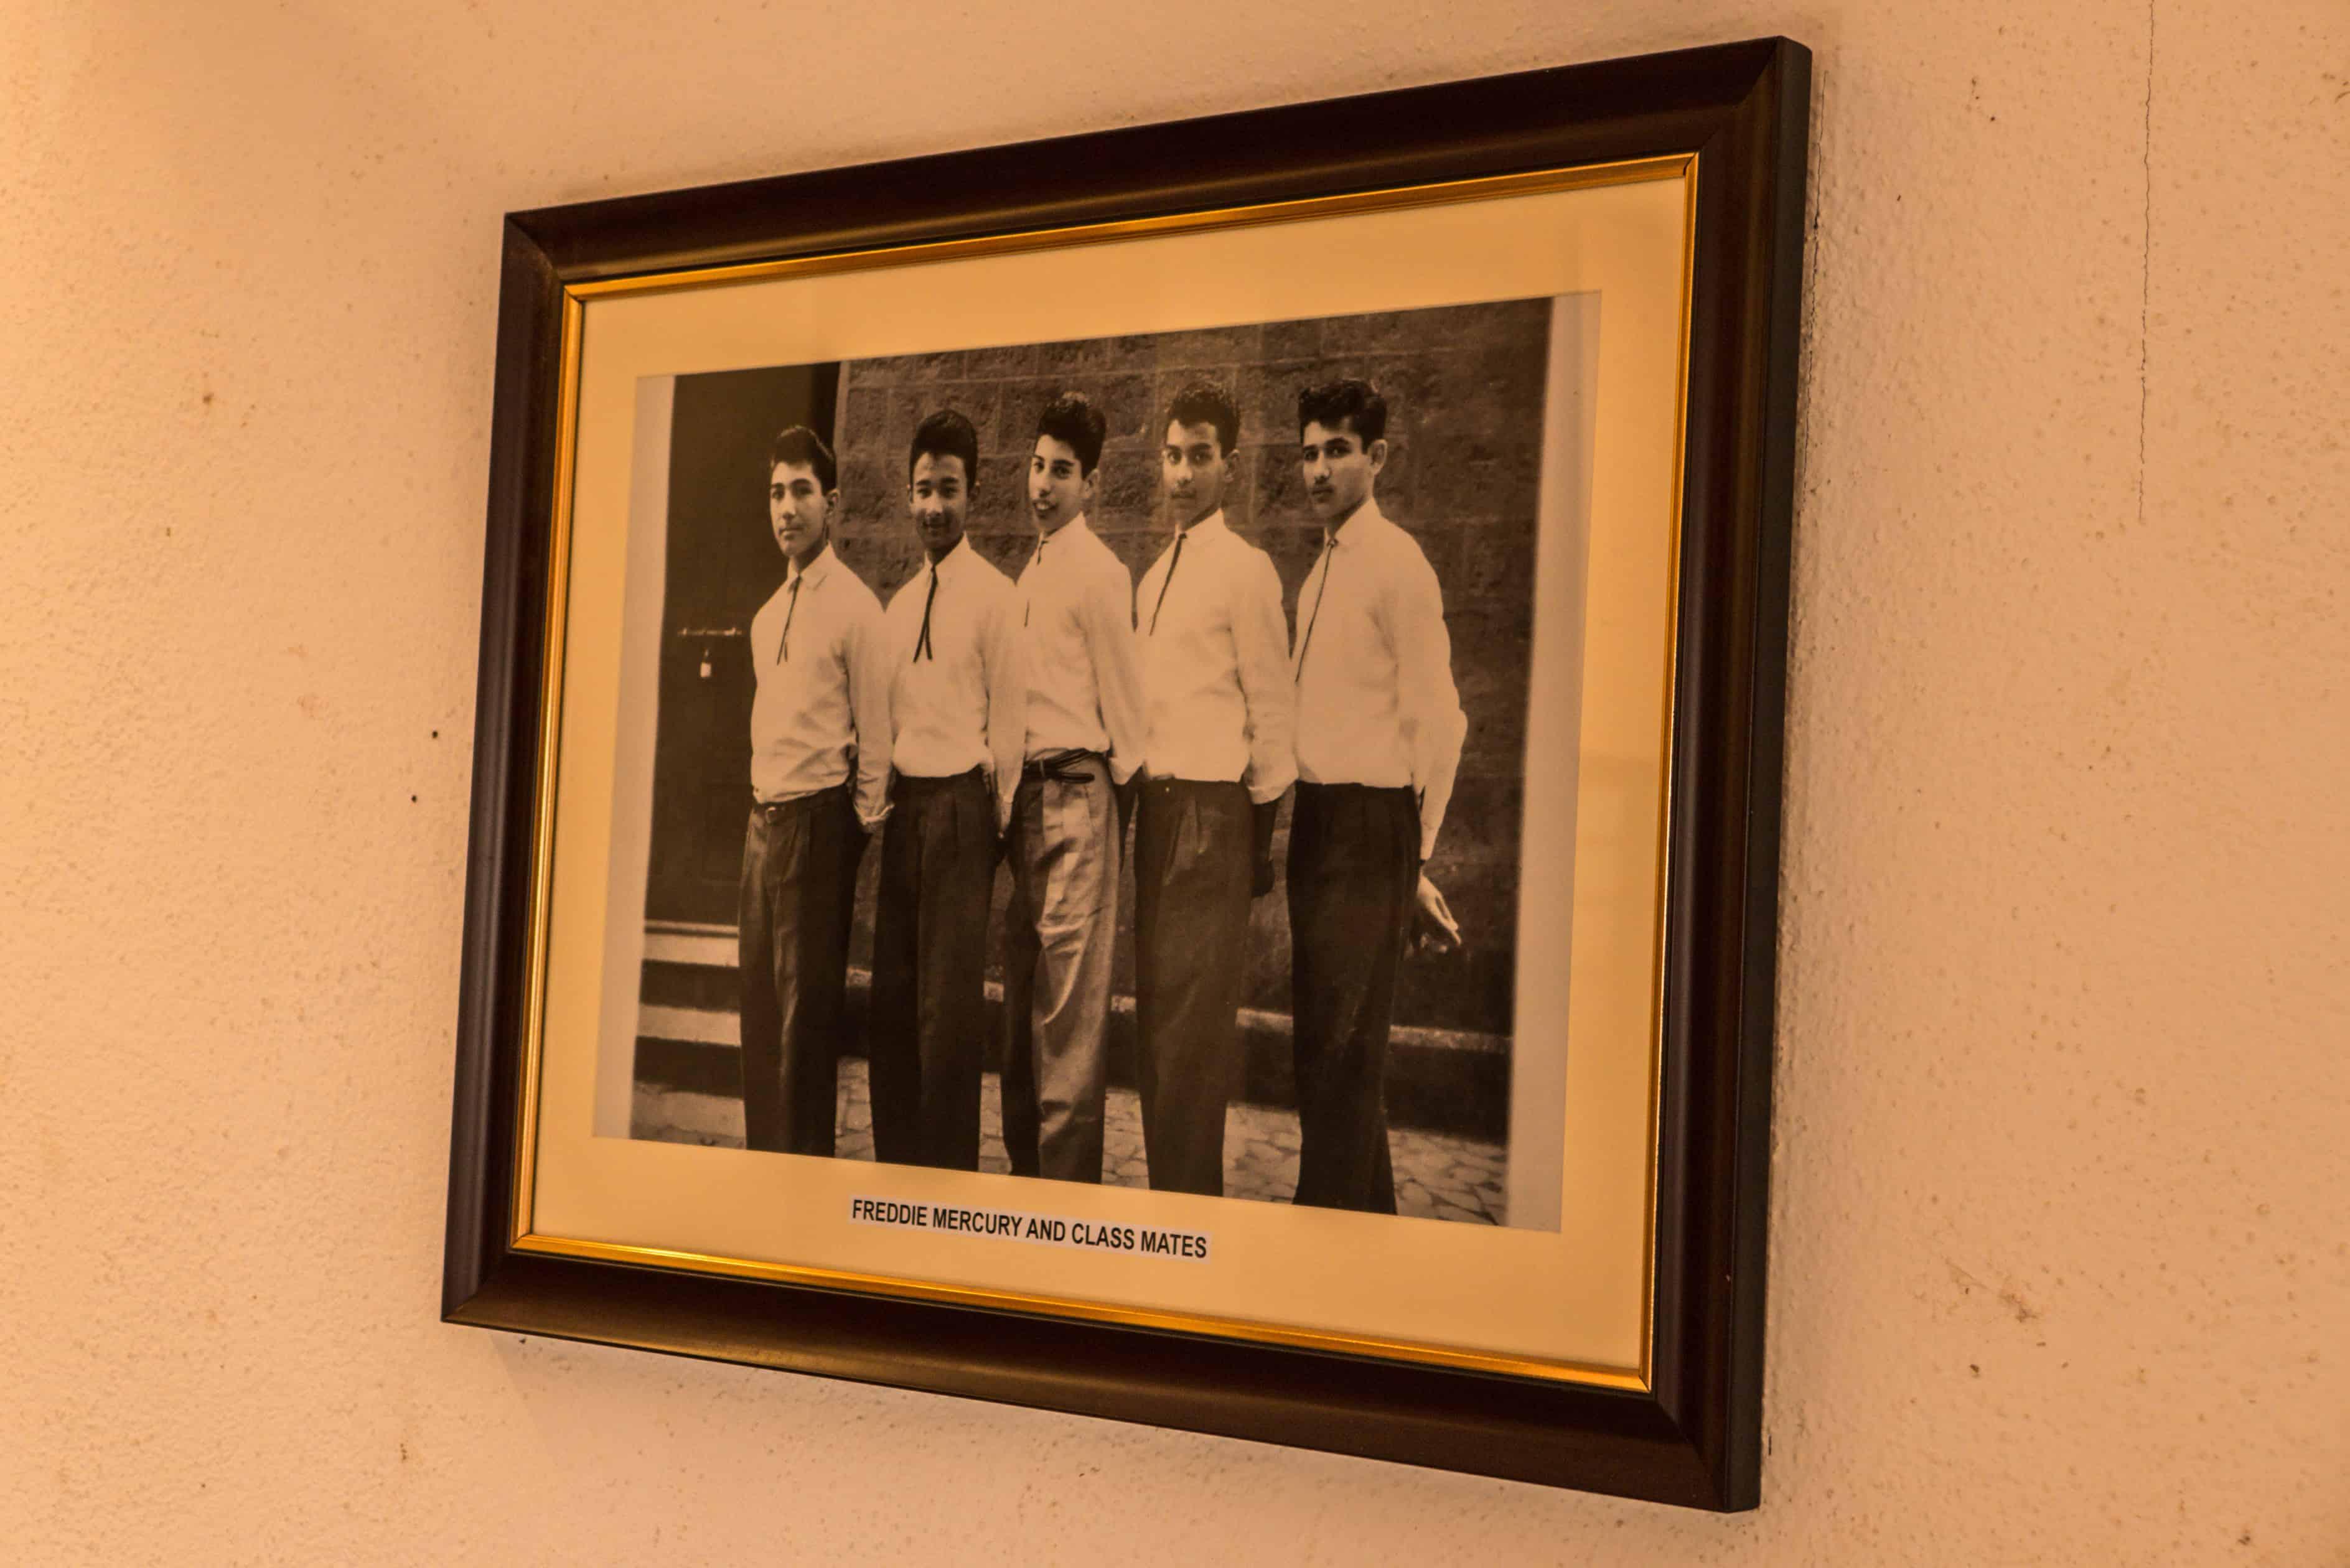 Panchgani, Freddie Mercury